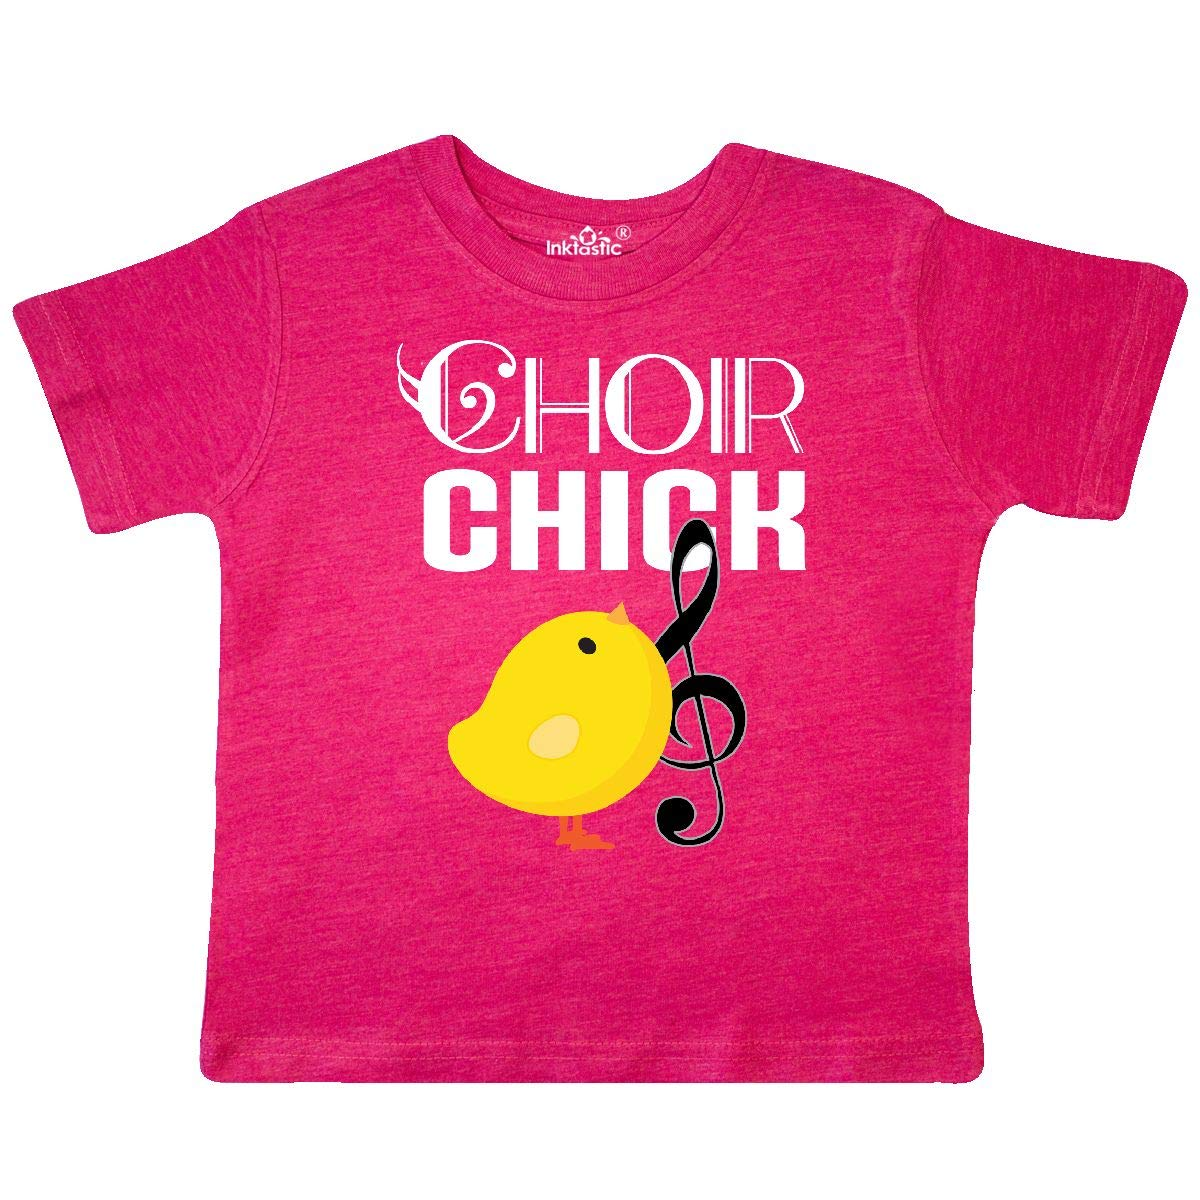 inktastic Choir Chick Music Gift Toddler T-Shirt